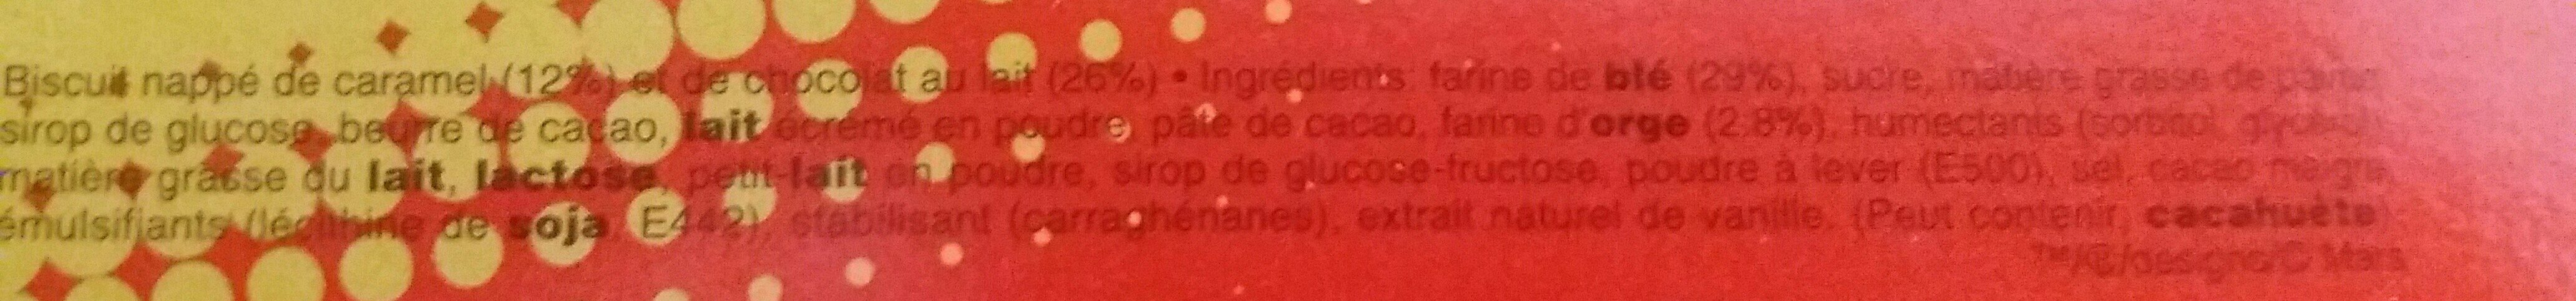 Twix top - Ingredientes - fr